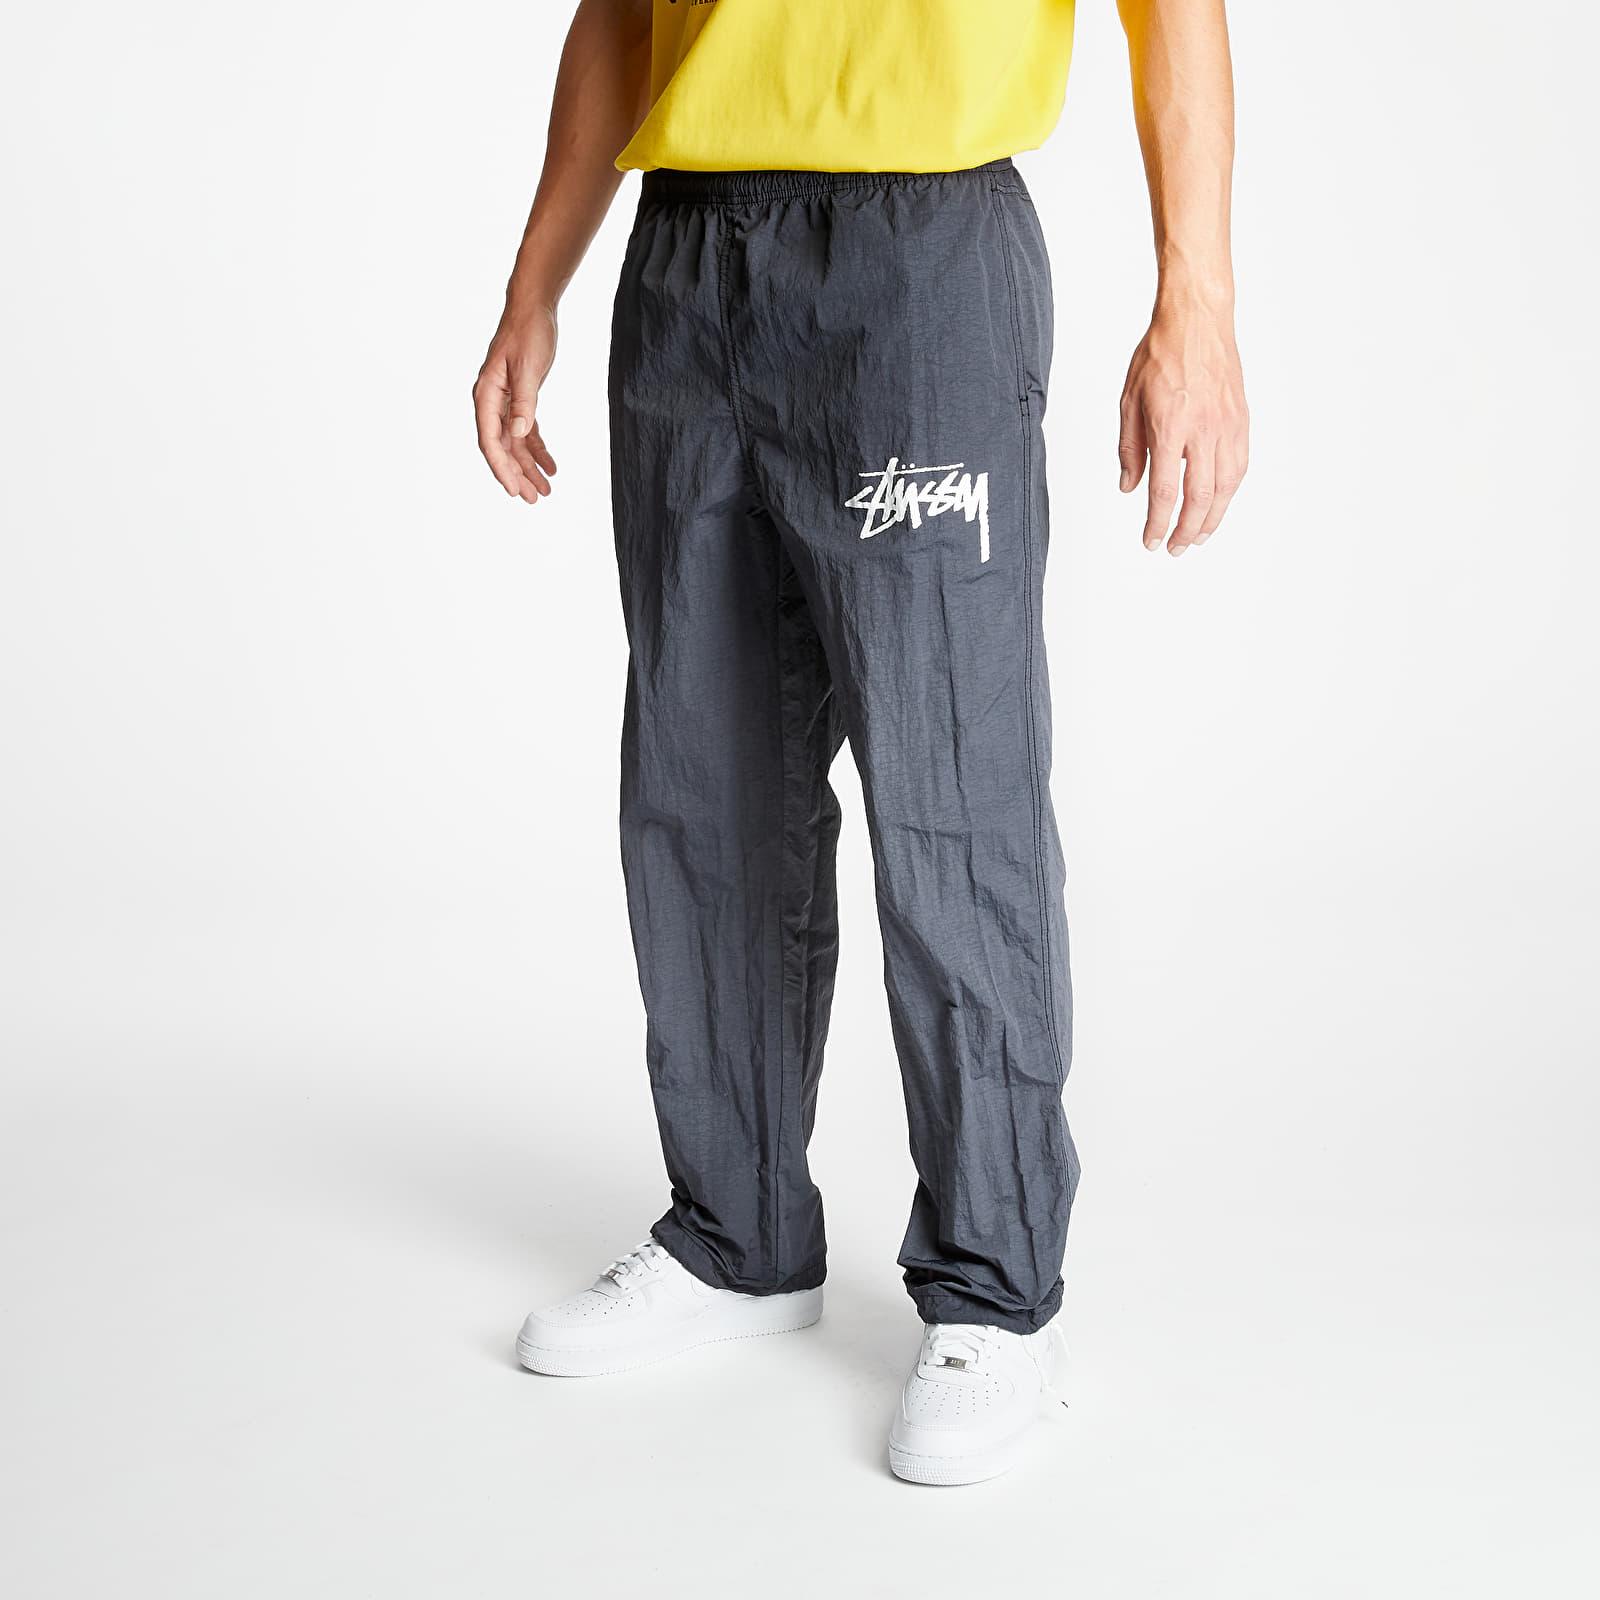 Pants and jeans Nike x Stüssy Beach Pants Off Noir